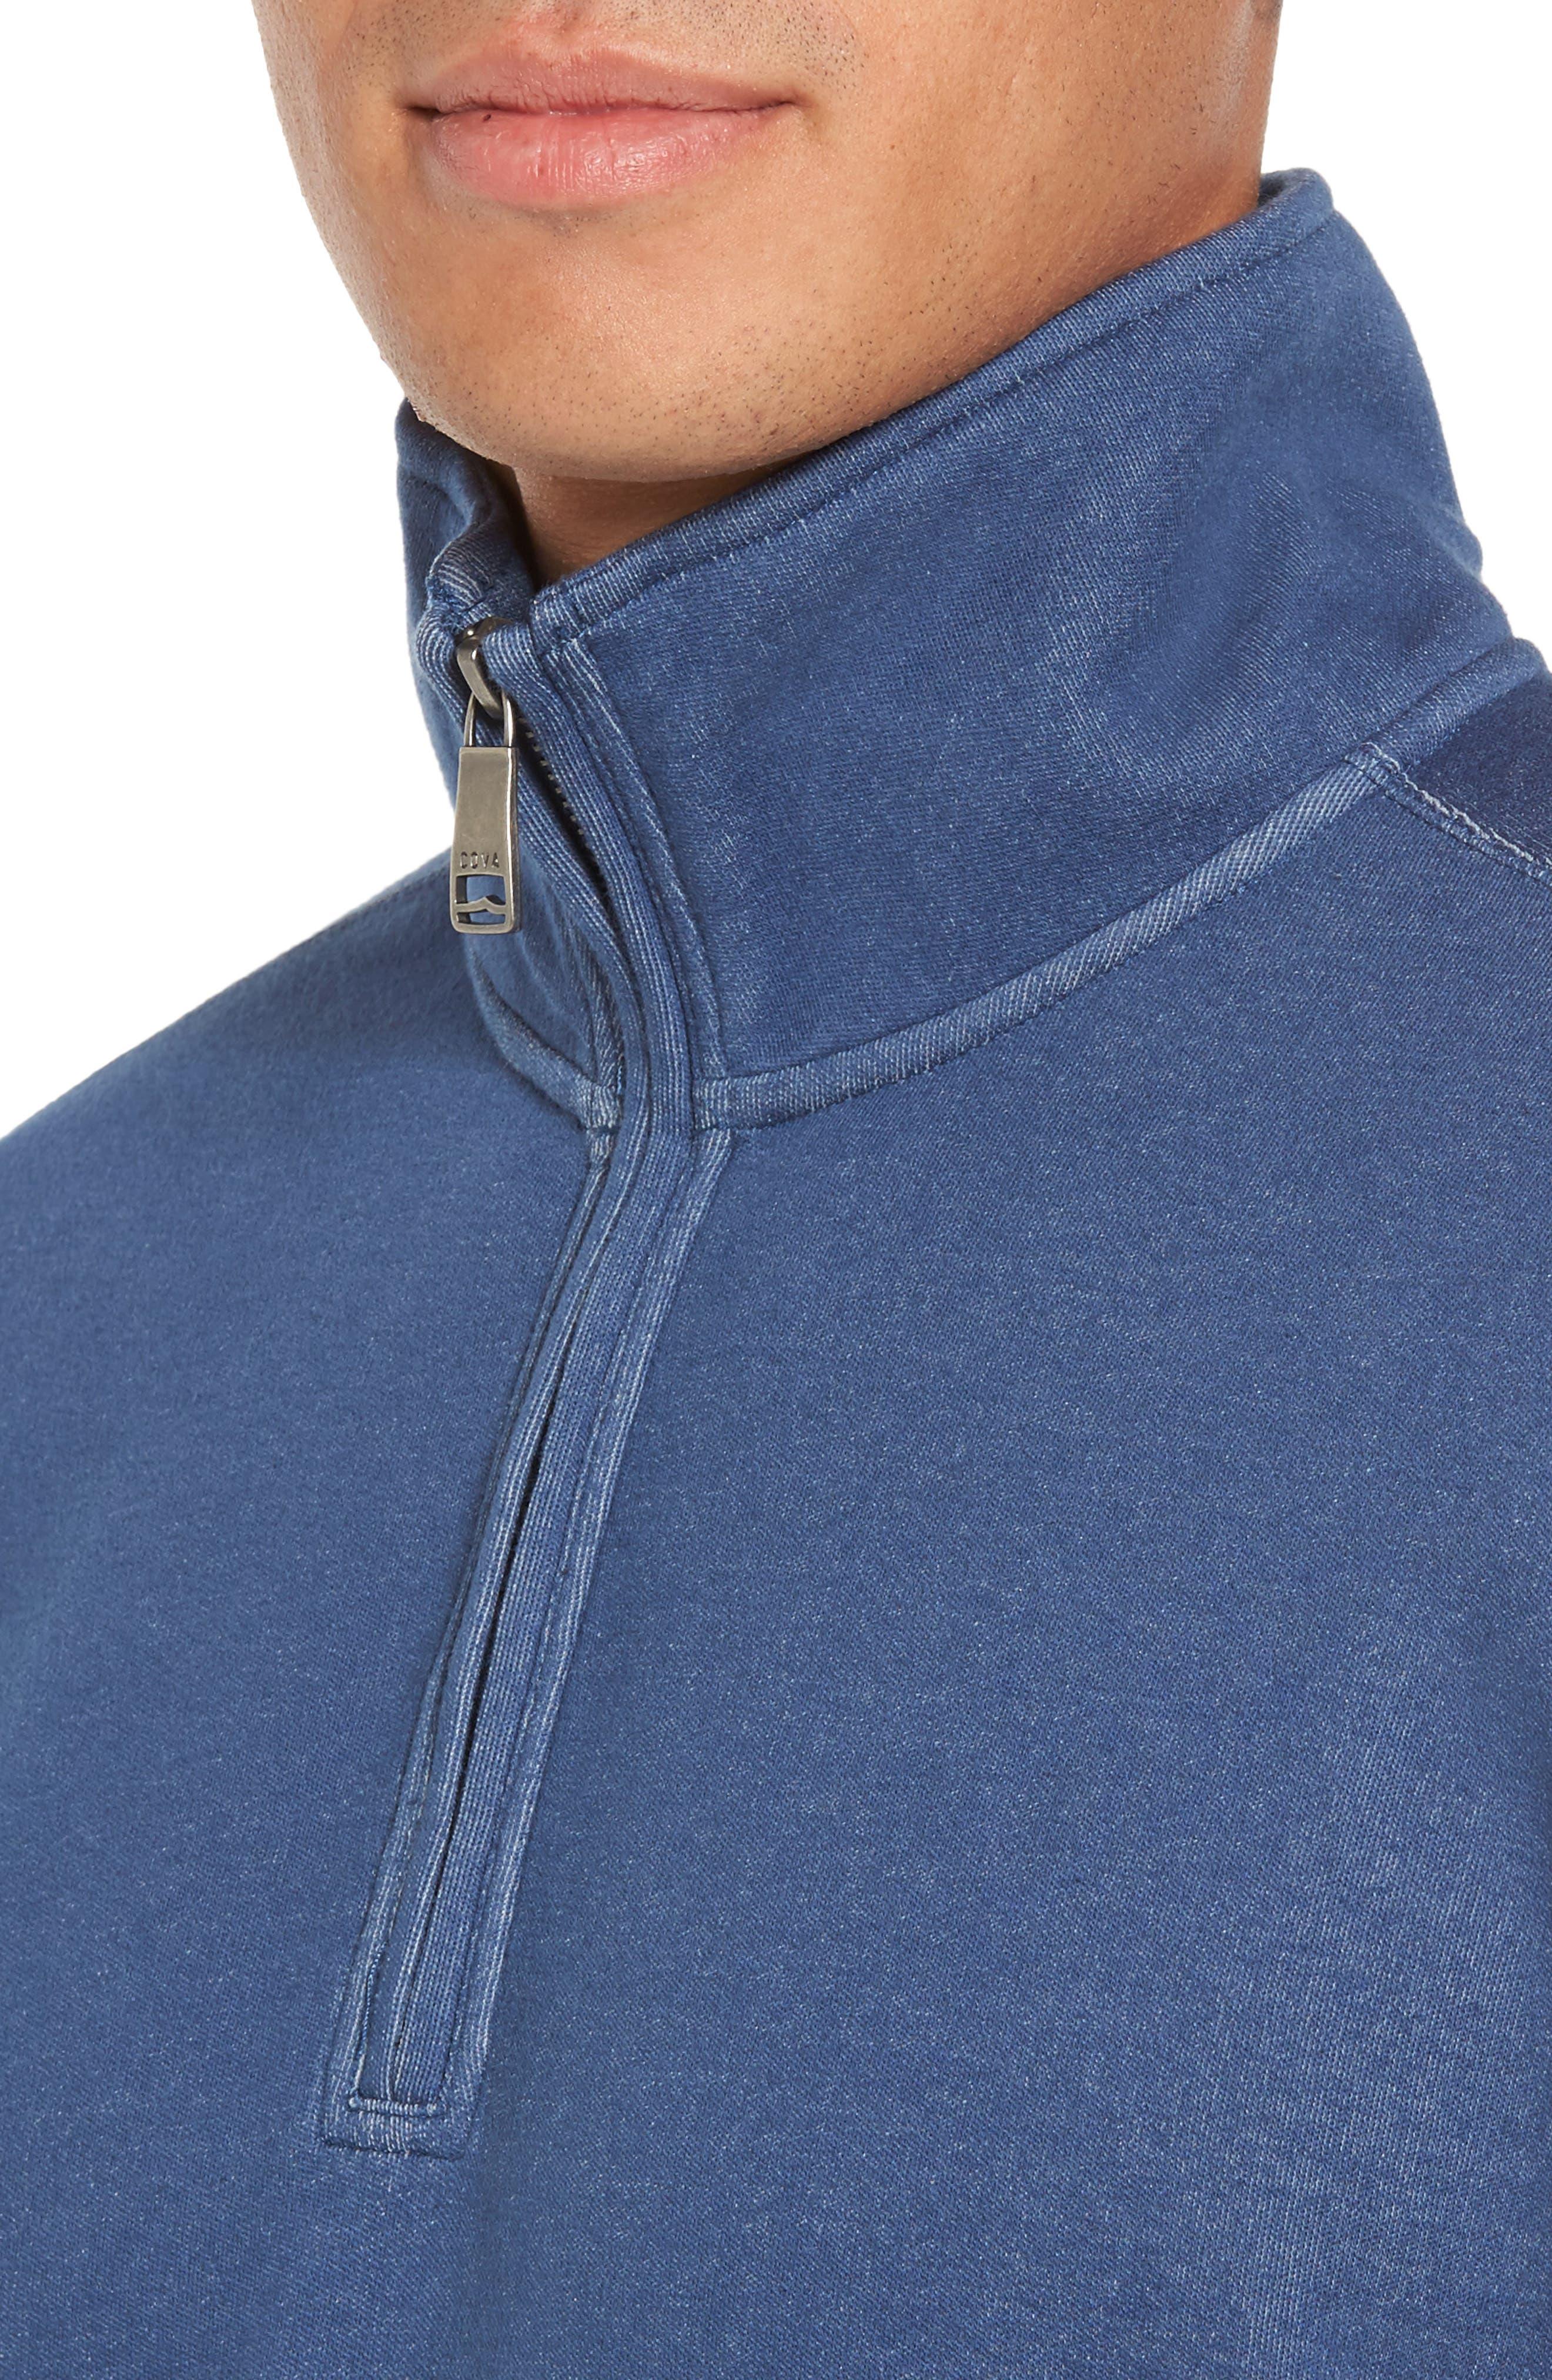 Upper Deck Half Zip Pullover,                             Alternate thumbnail 4, color,                             410